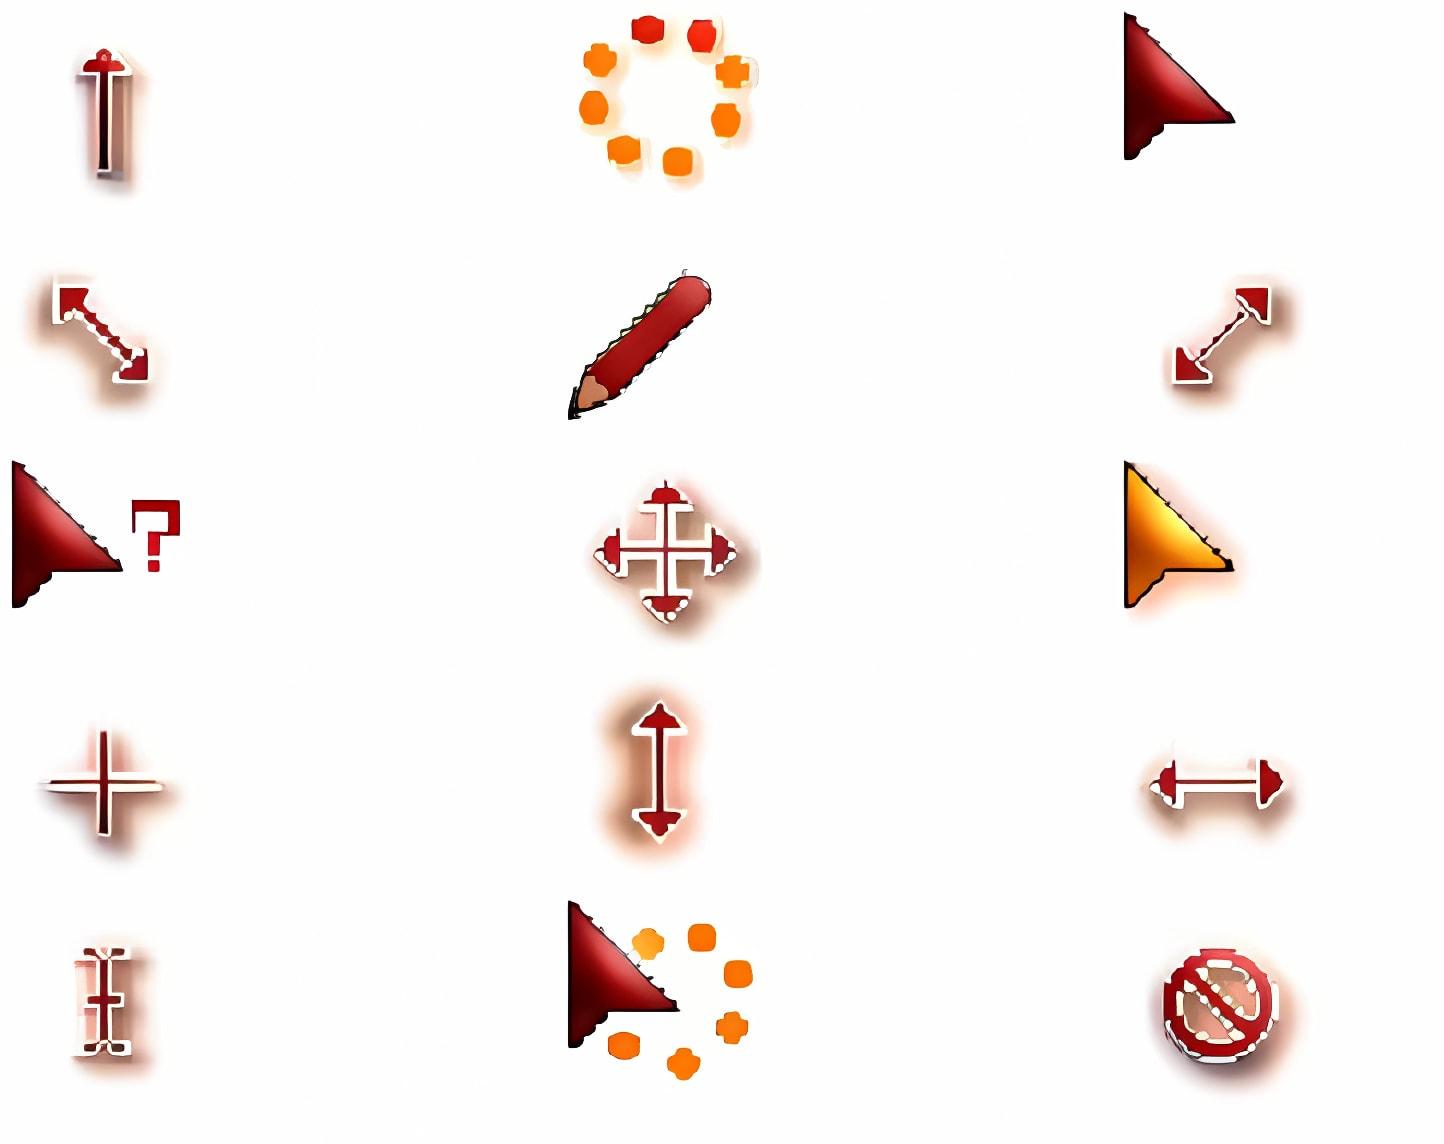 Alfyxk d red cursor download for xp